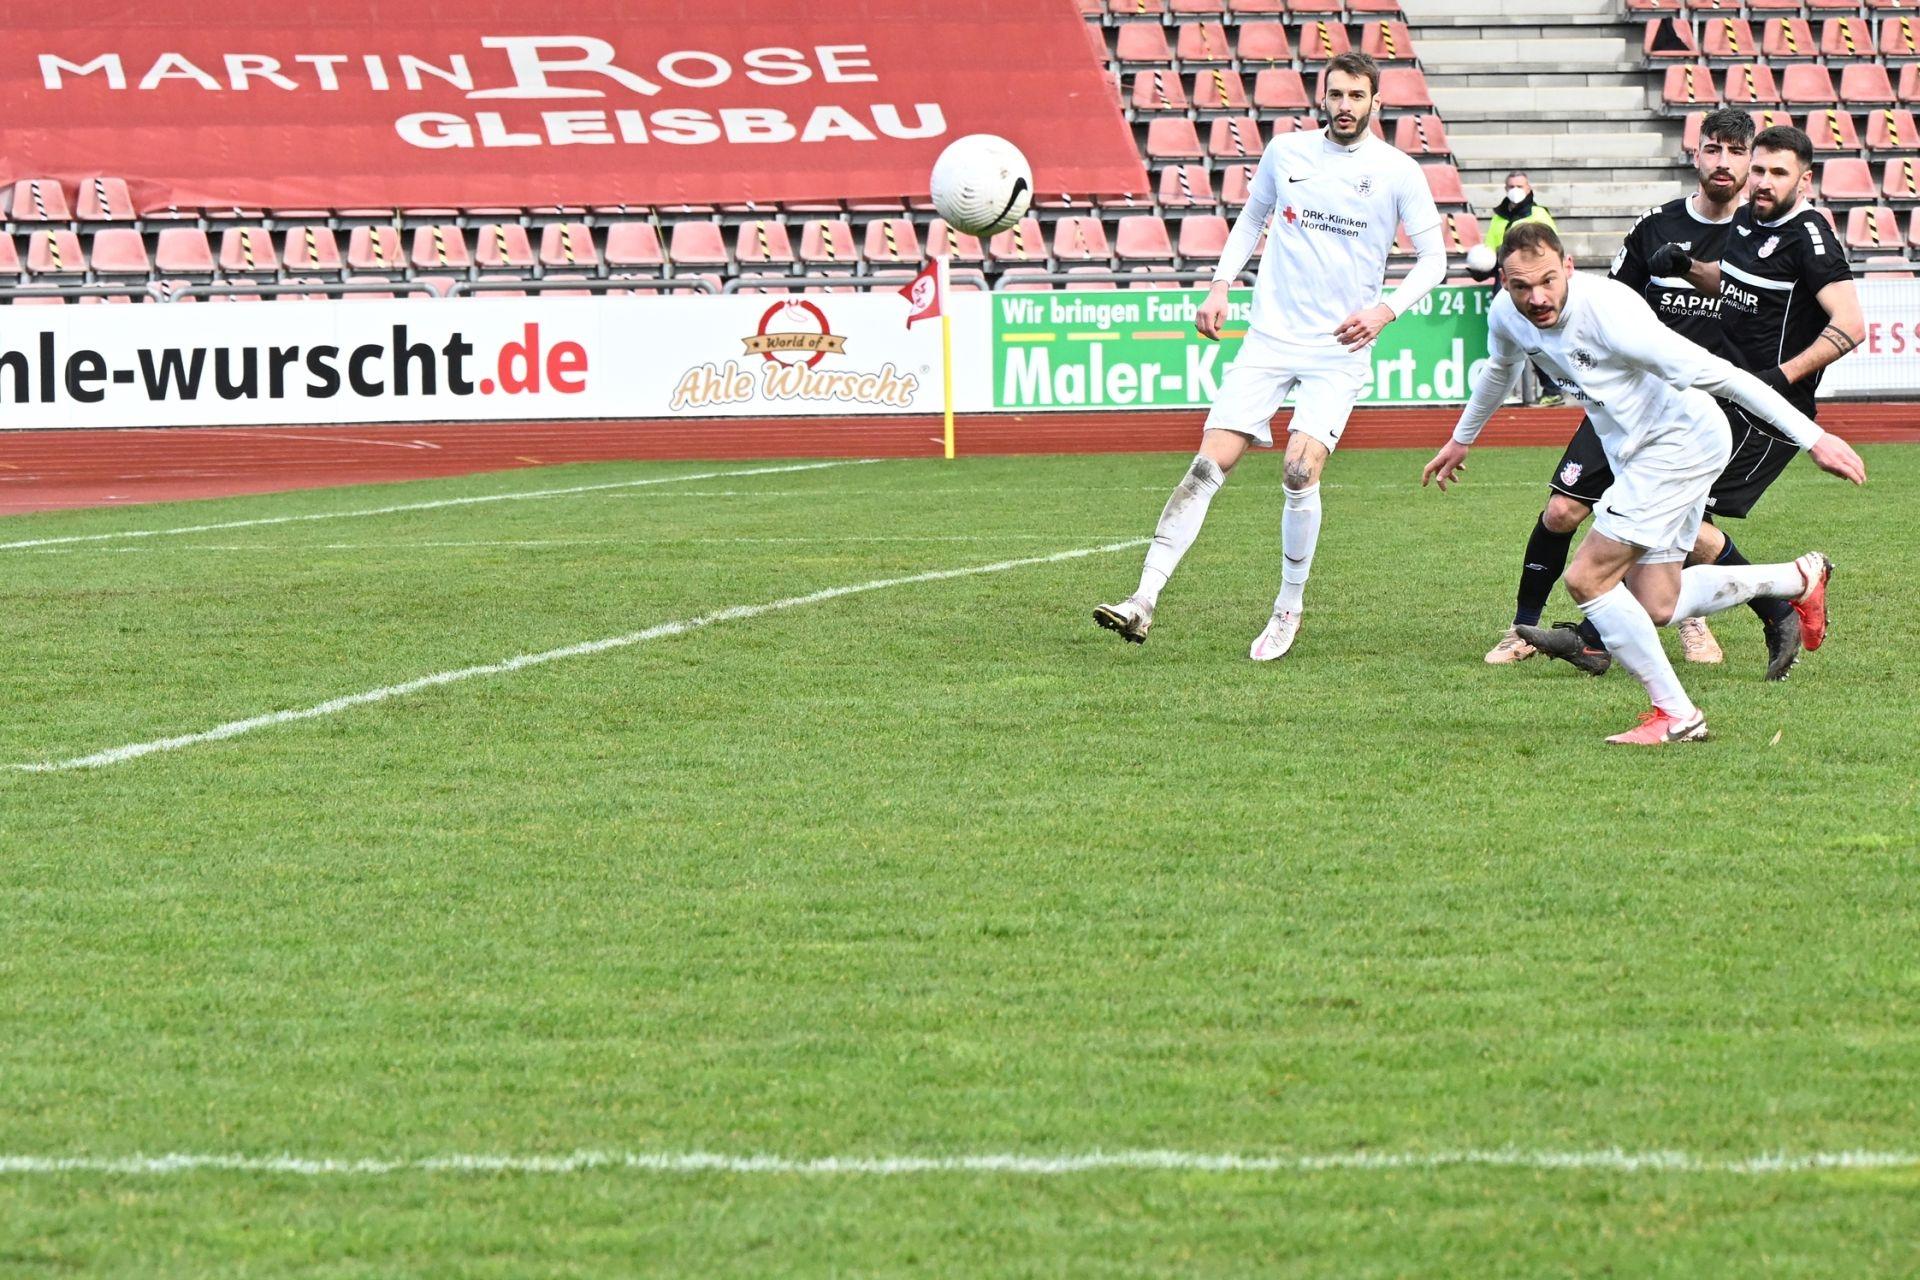 Regionalliga Südwest 2020/21, KSV Hessen Kassel, FSV Frankfurt, Endstand 2:1, Kevin Nennhuber, Robin Urban